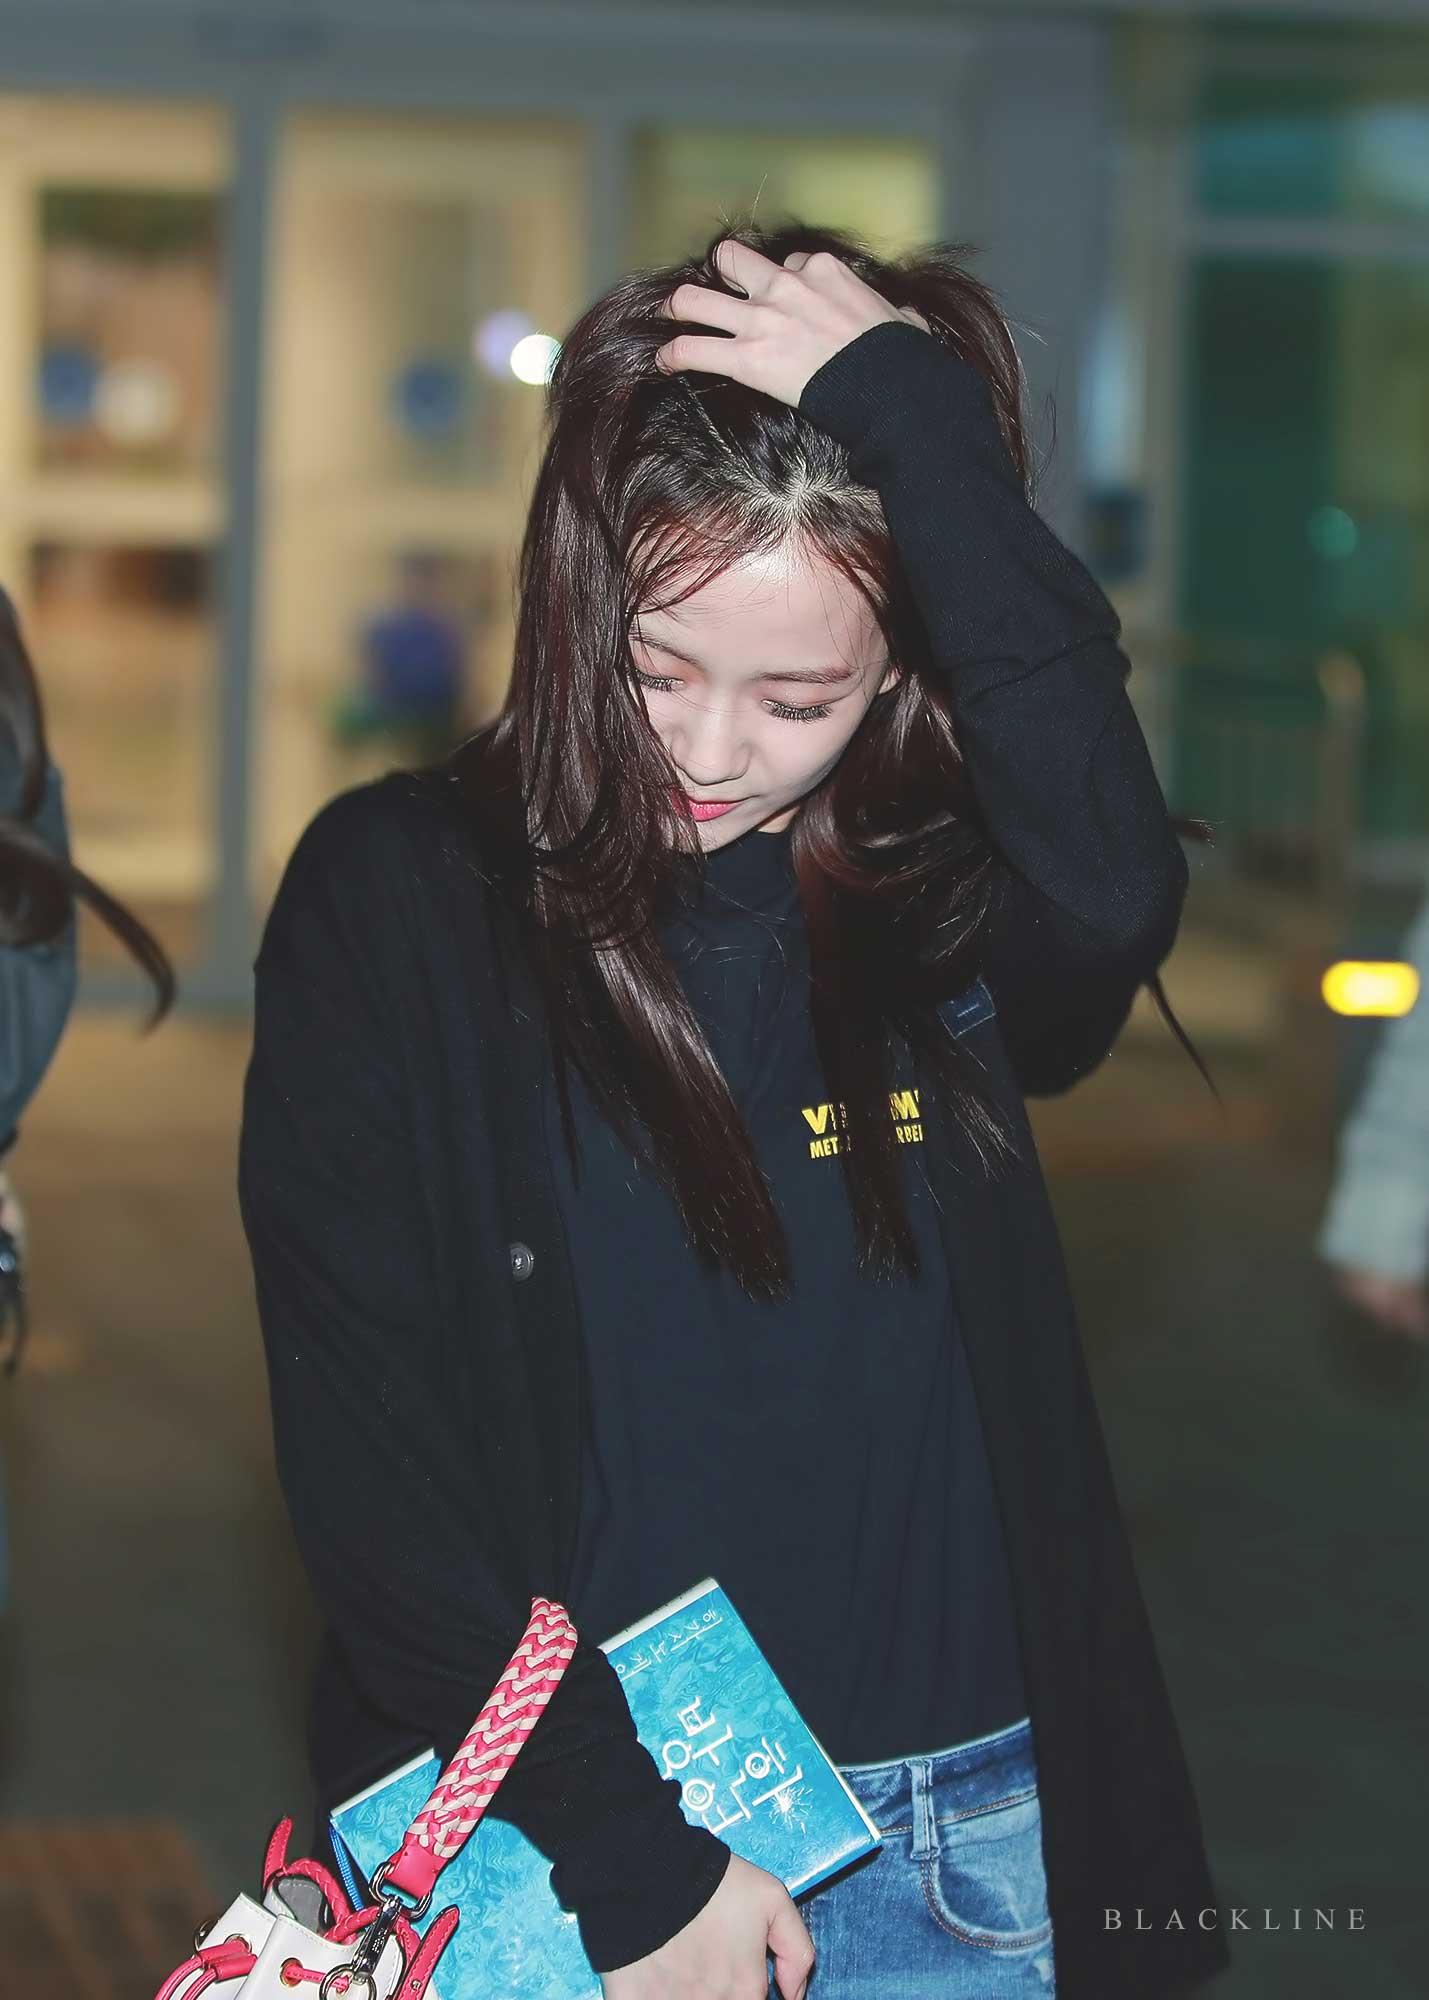 Blackpink Jisoo Airport Fashion 5 April 2018 Incheon